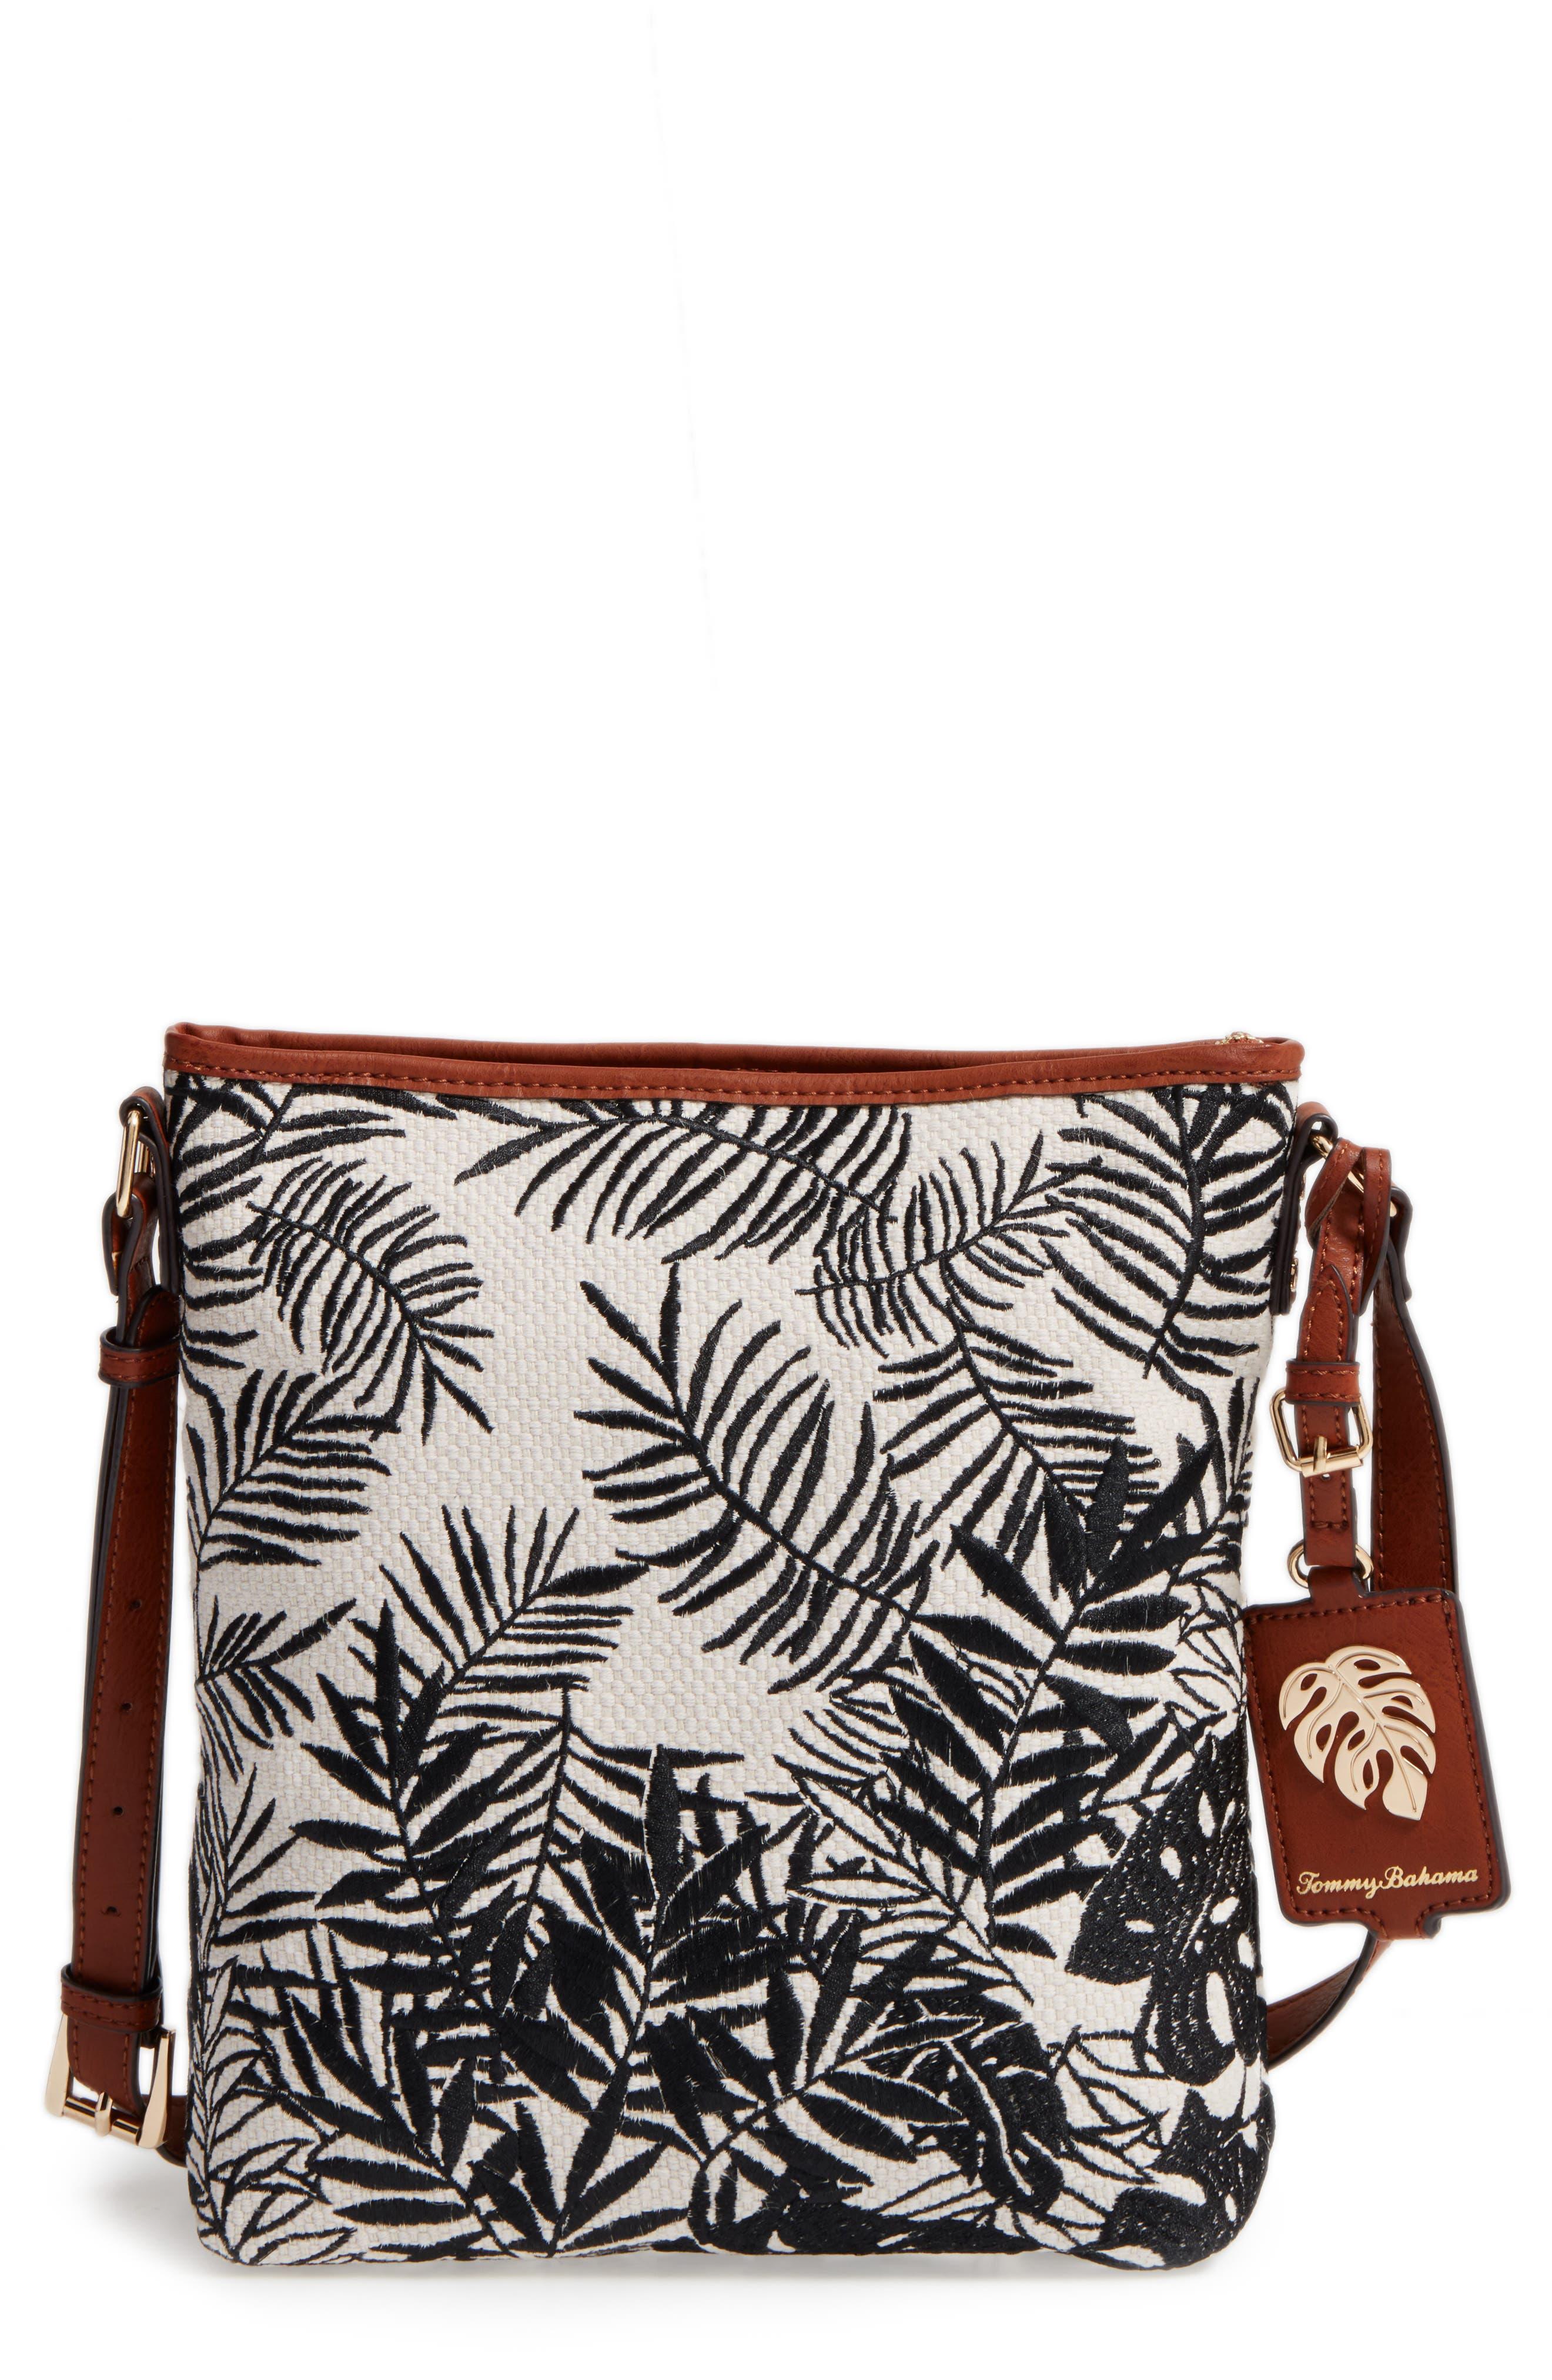 Palm Beach Crossbody Bag,                             Main thumbnail 1, color,                             008